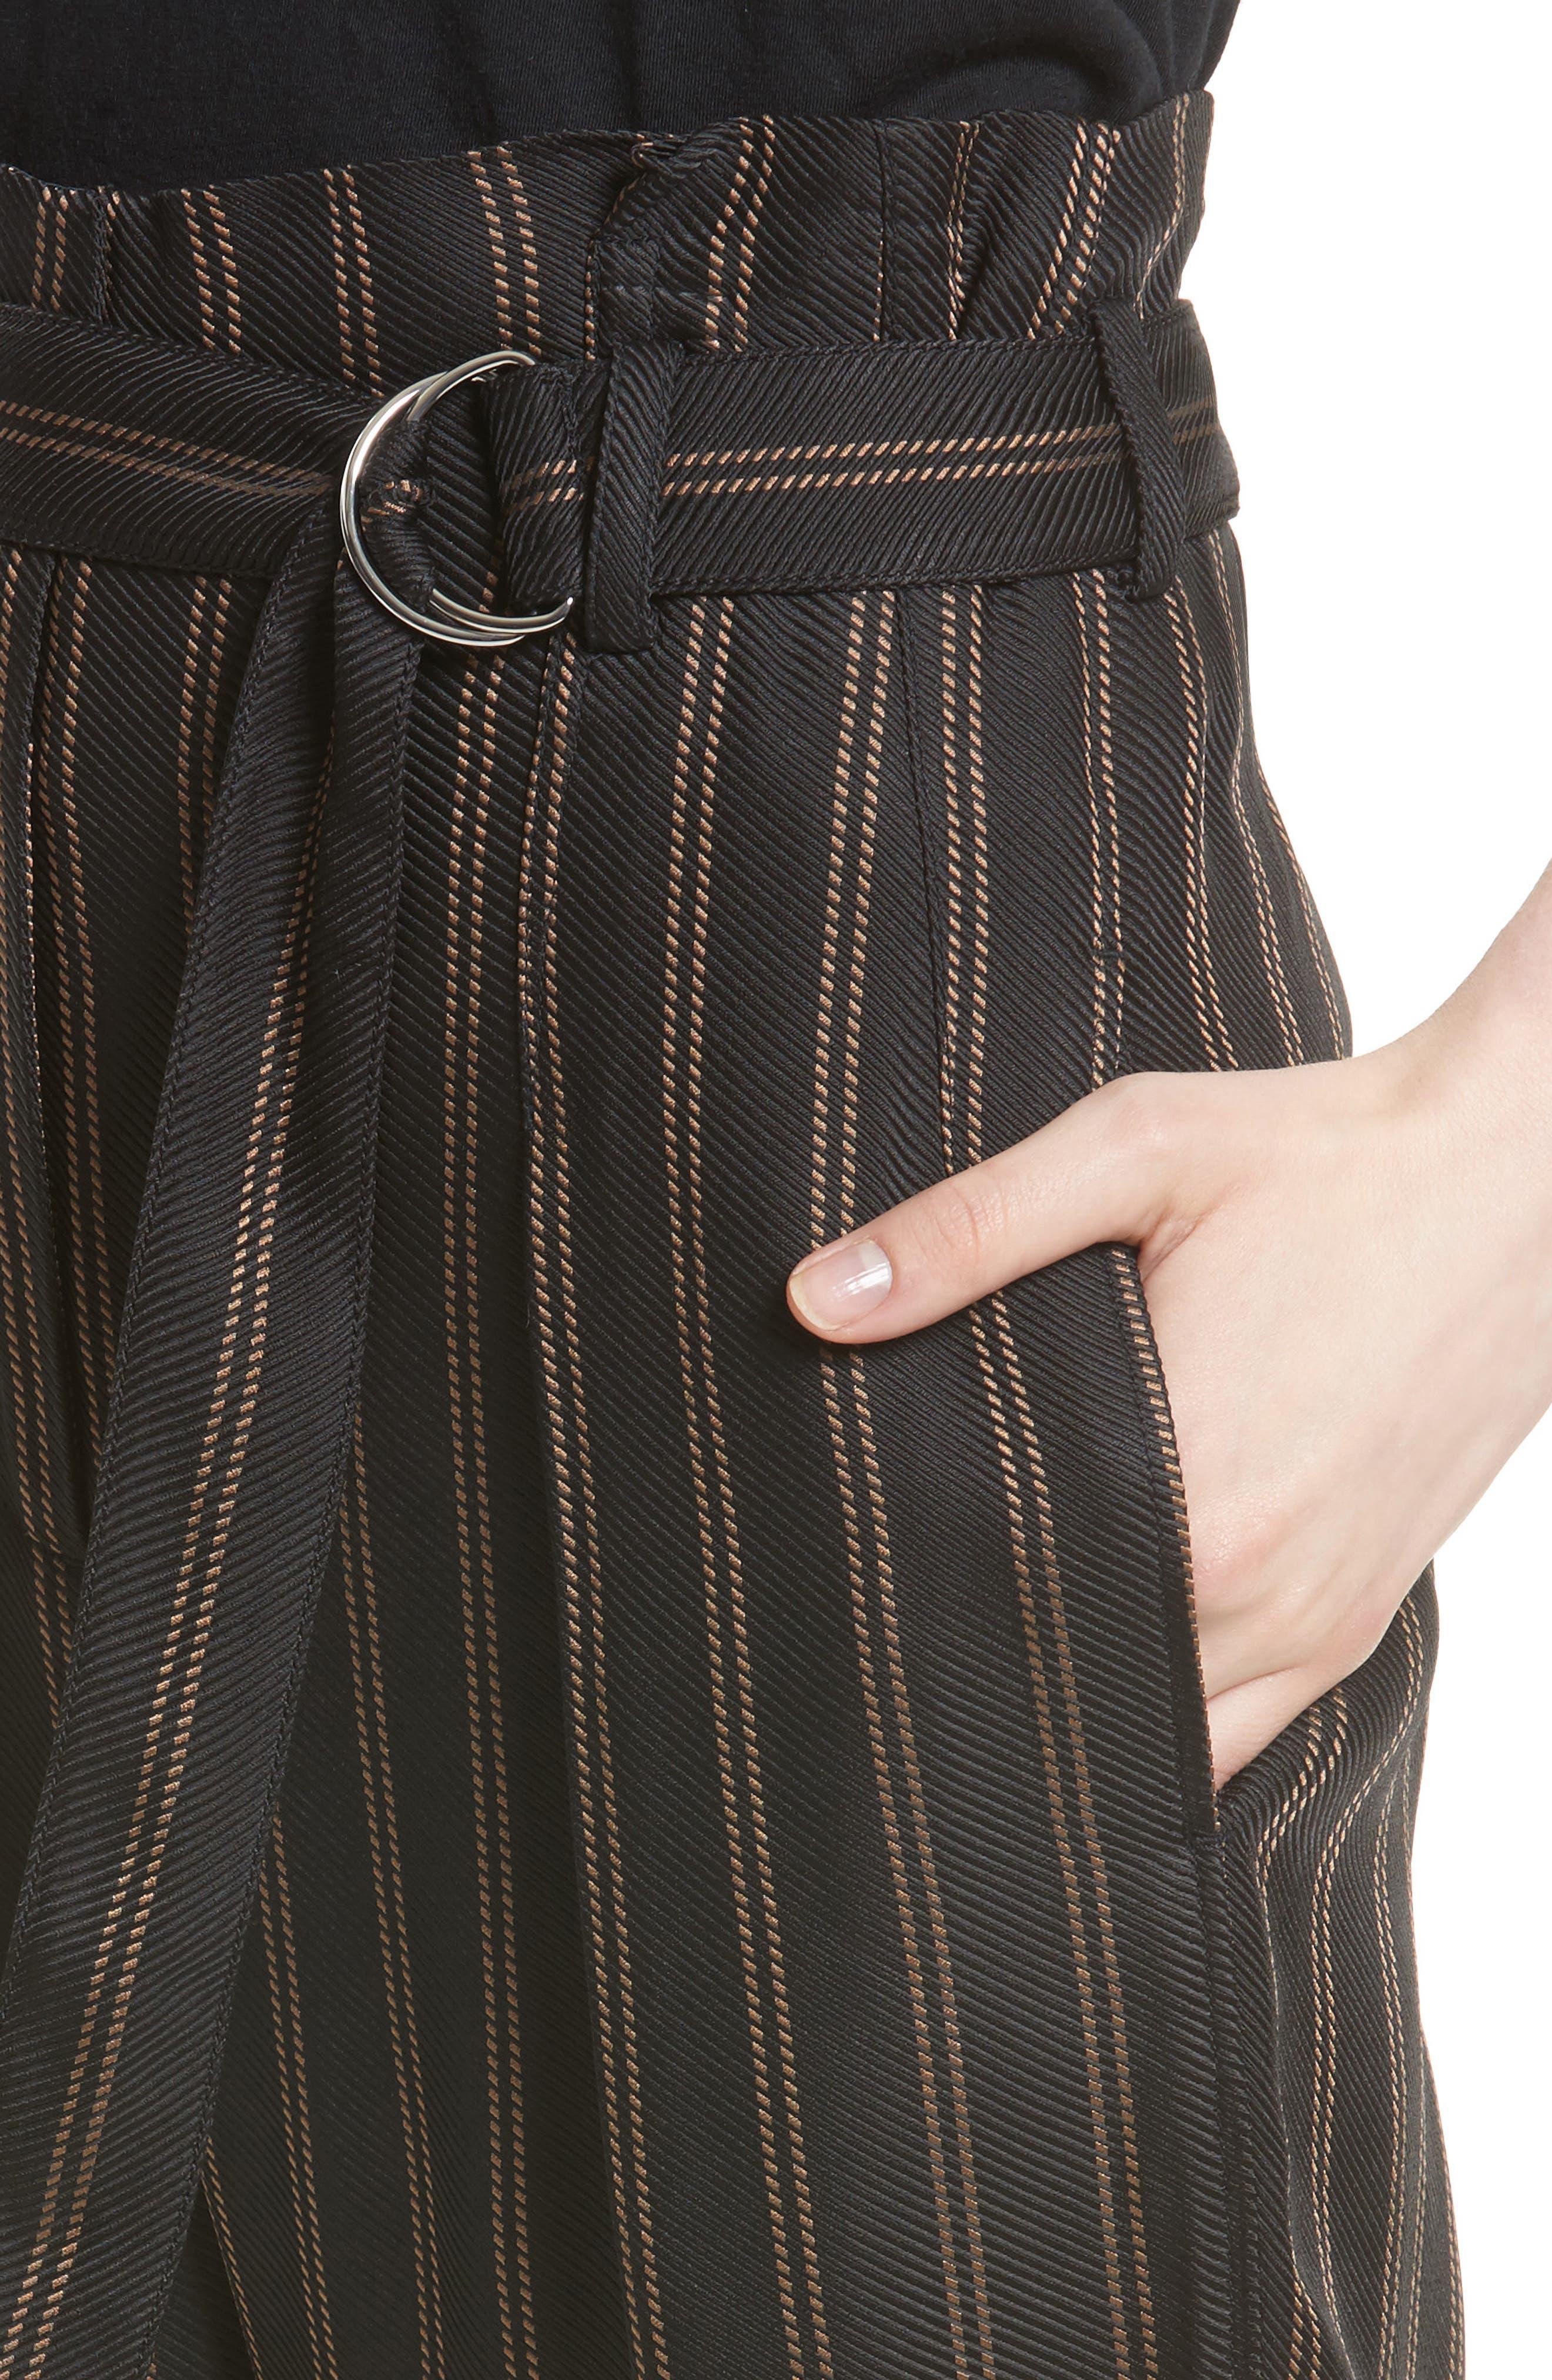 Belted Pleat Crop Pants,                             Alternate thumbnail 5, color,                             Black/ Tan